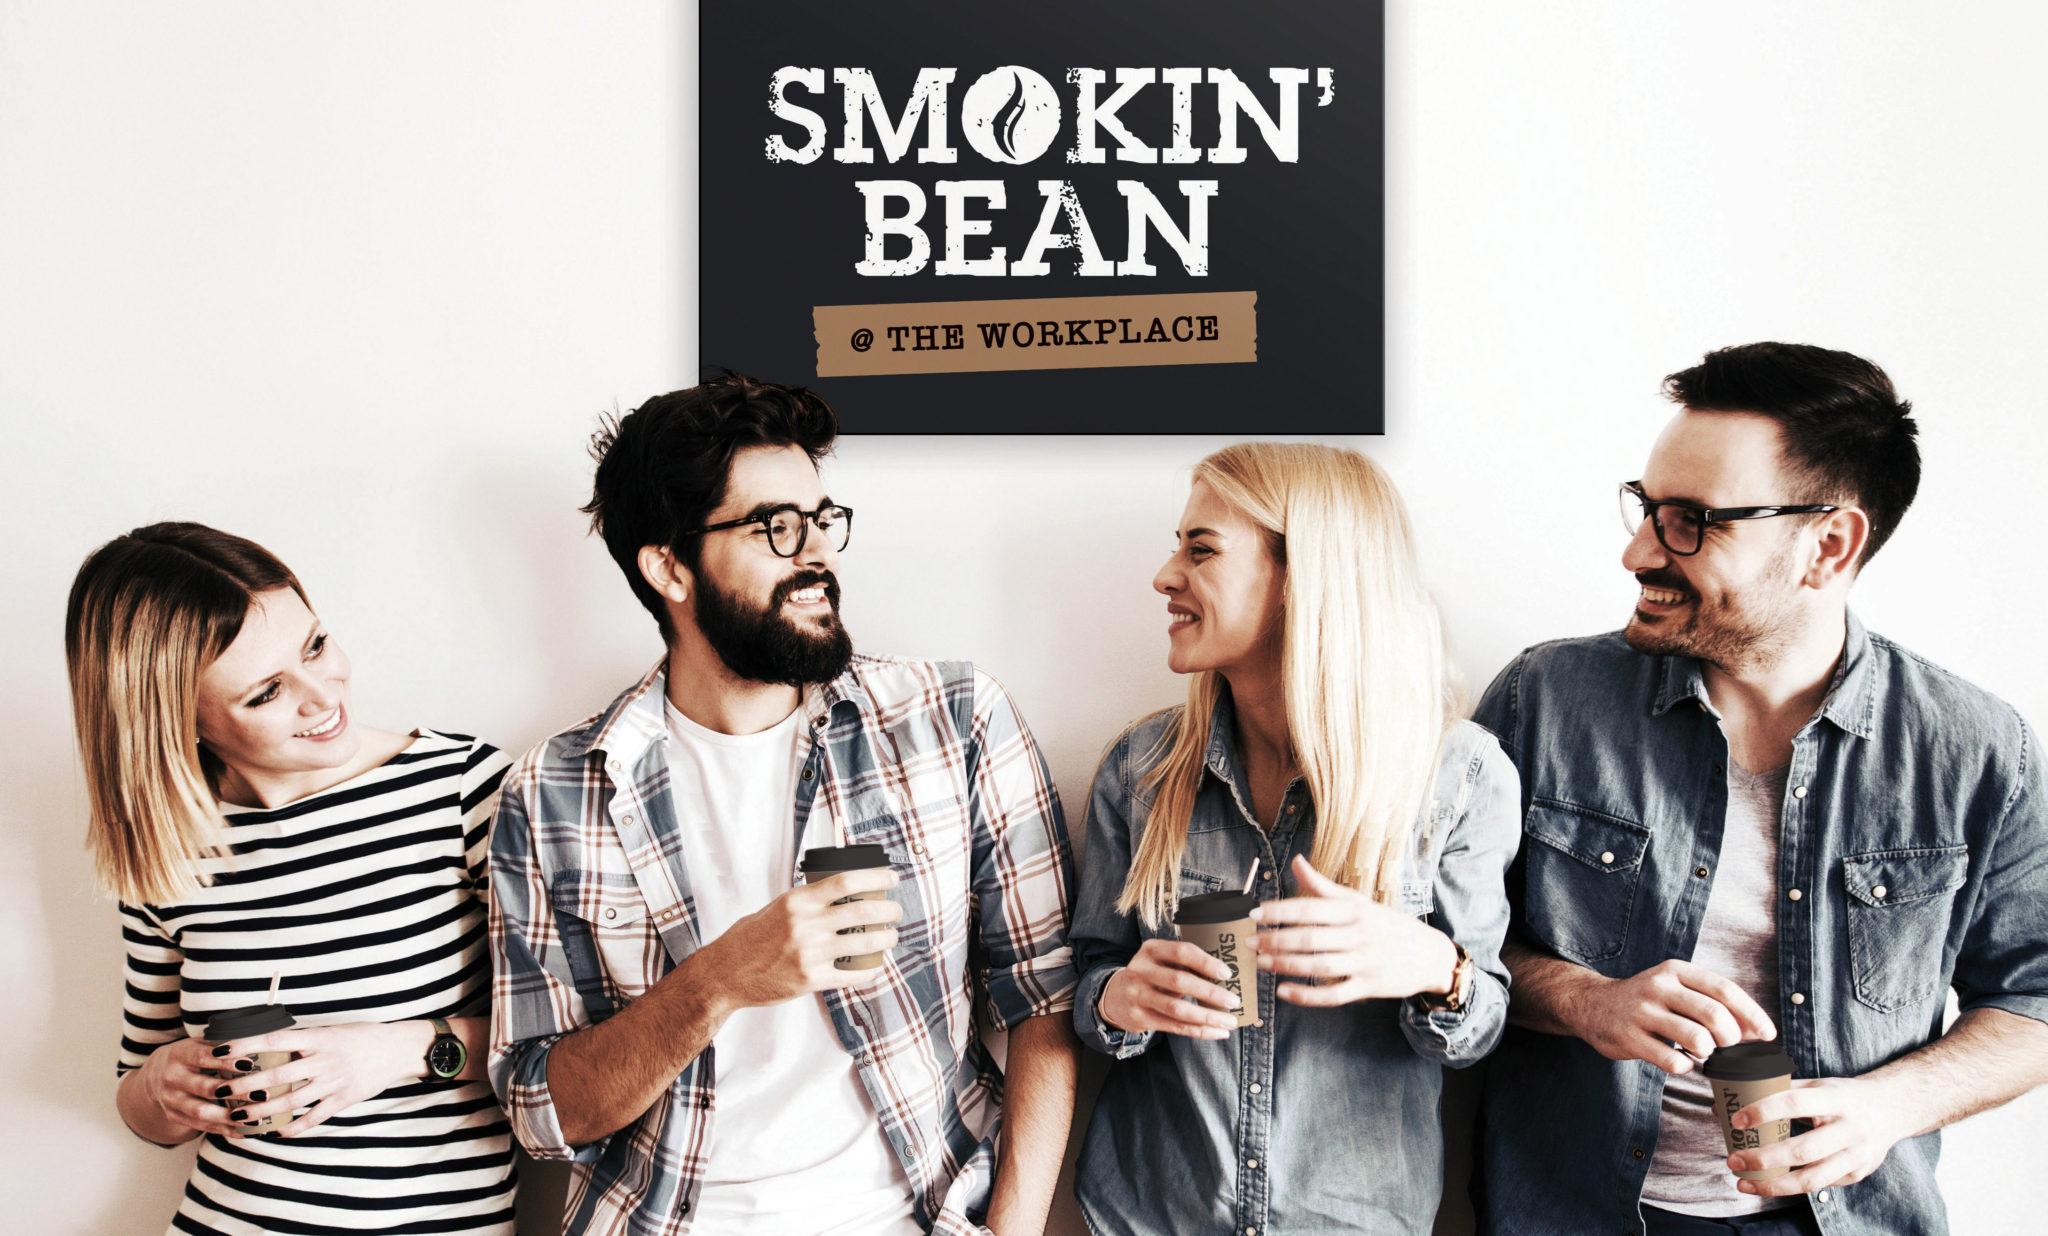 Smokin Bean at the Workplace